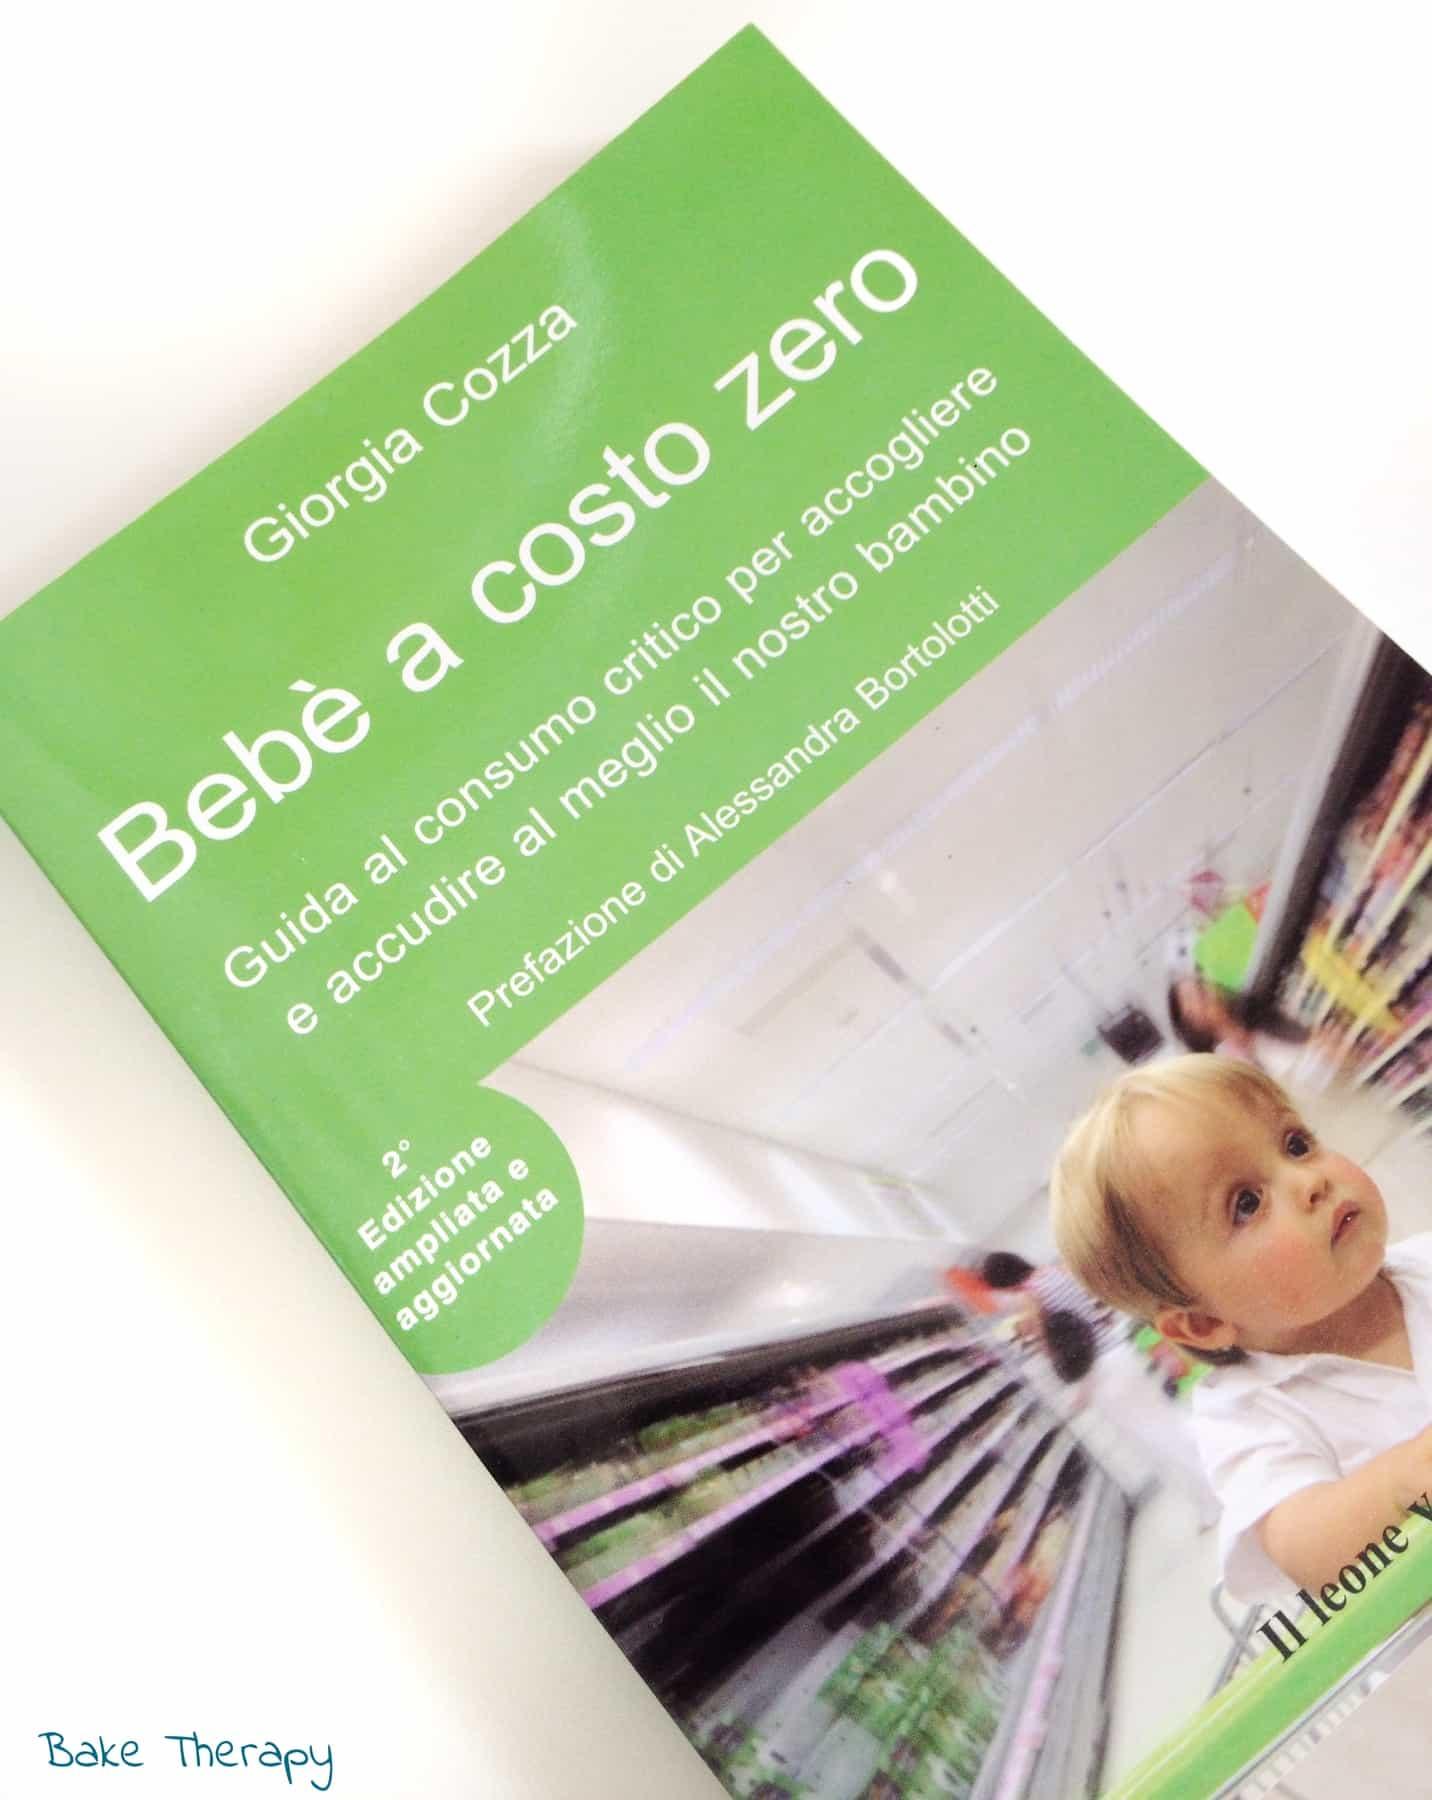 Bebè a costo zero – G. Cozza